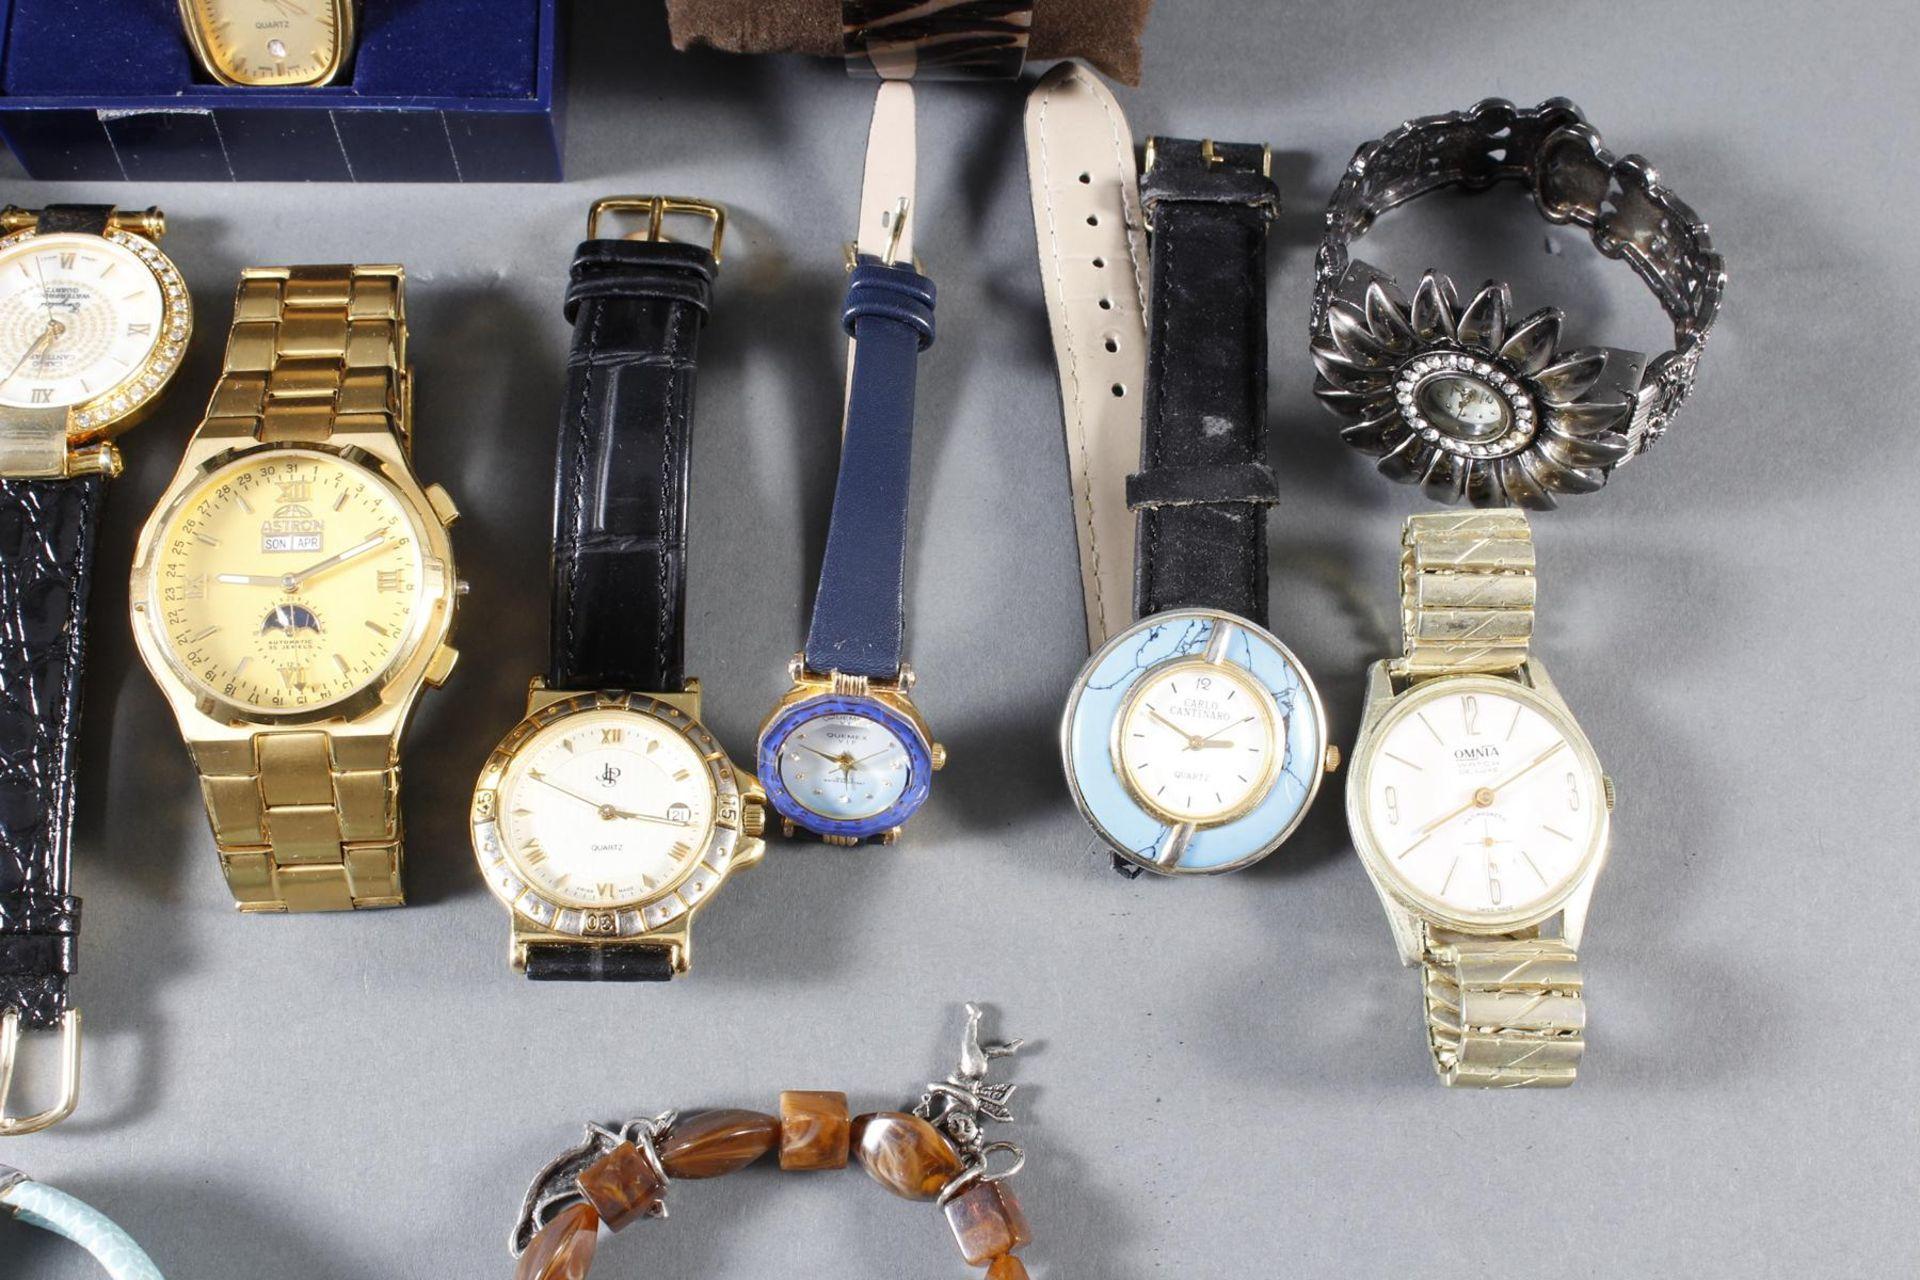 Konvolut Damen und Herrenarmbanduhren, 14 Stück - Bild 3 aus 7